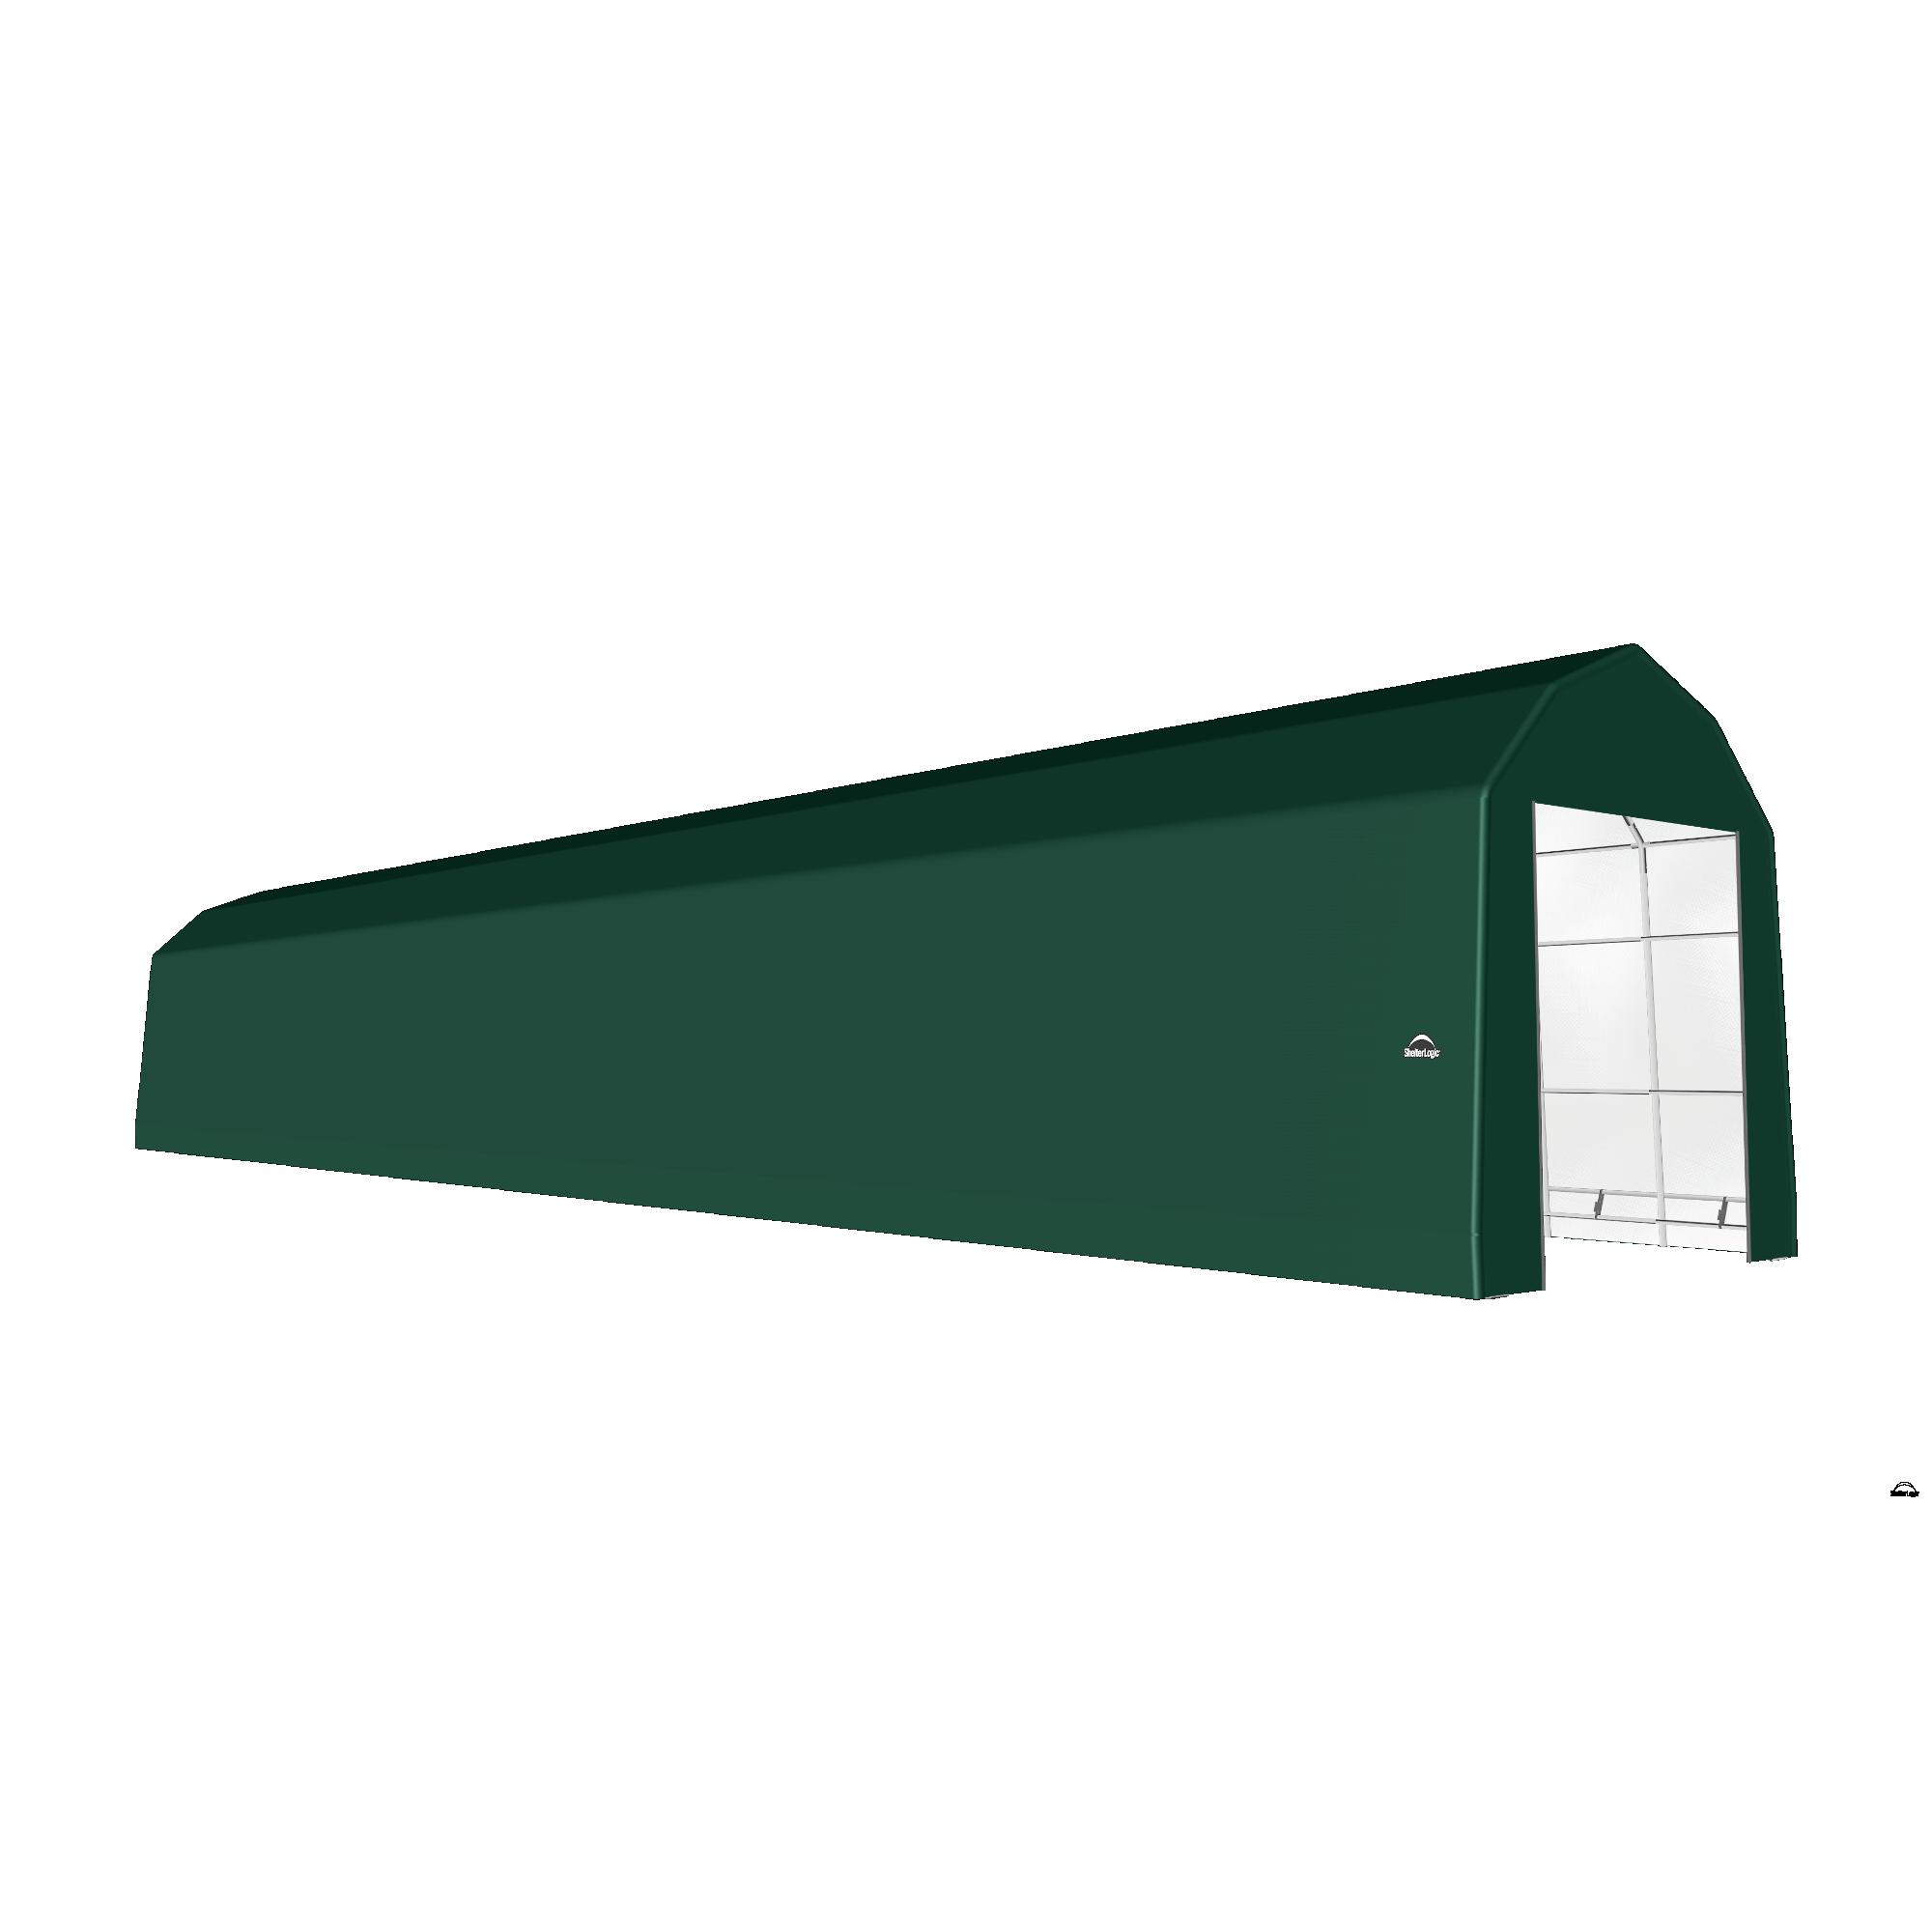 SP Barn 15X92X17 Green 14 oz PE Shelter